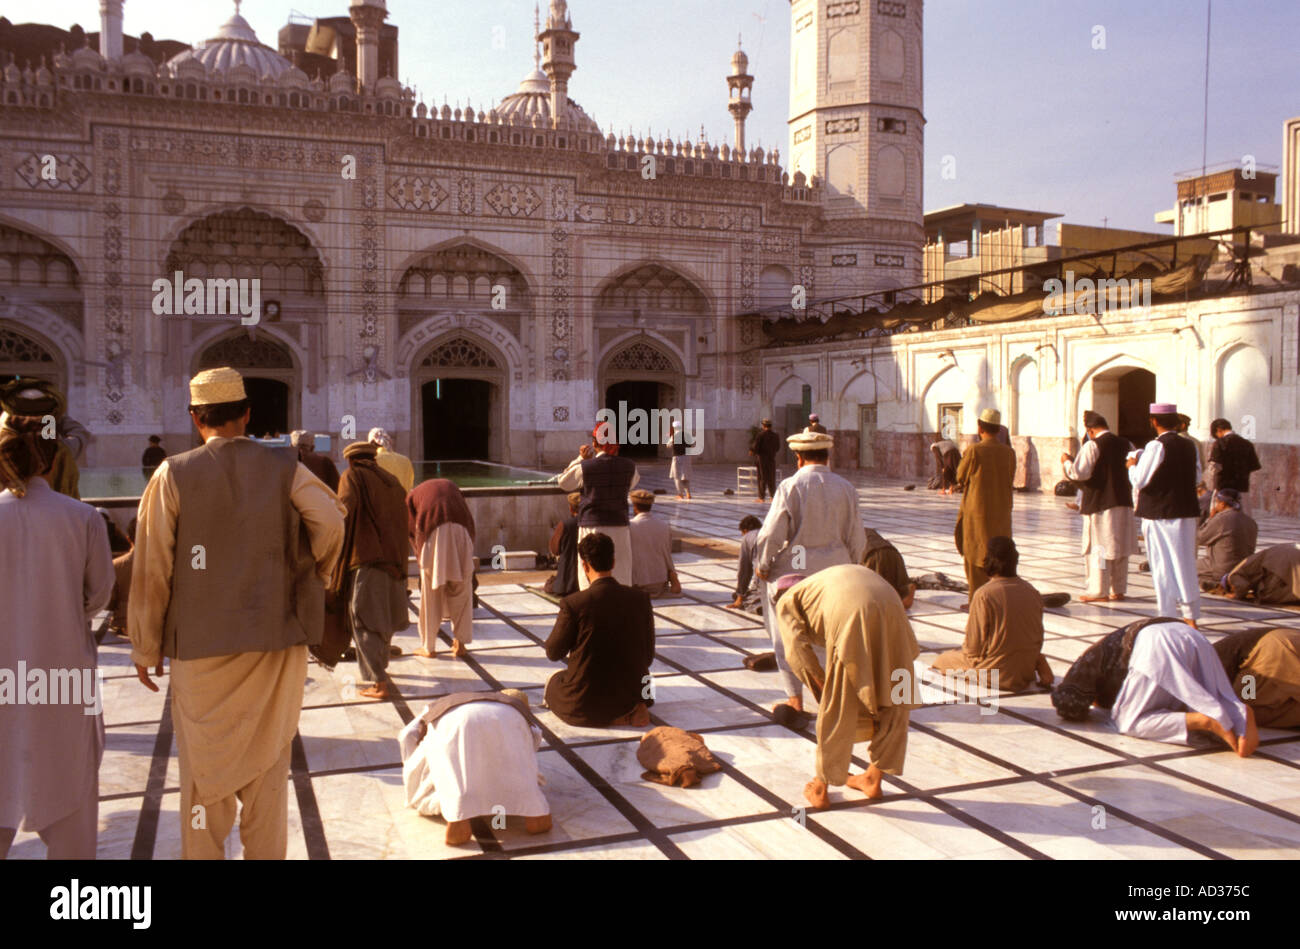 Prayer in Mahabat Khan mosque in Peshawar Pakistan - Stock Image